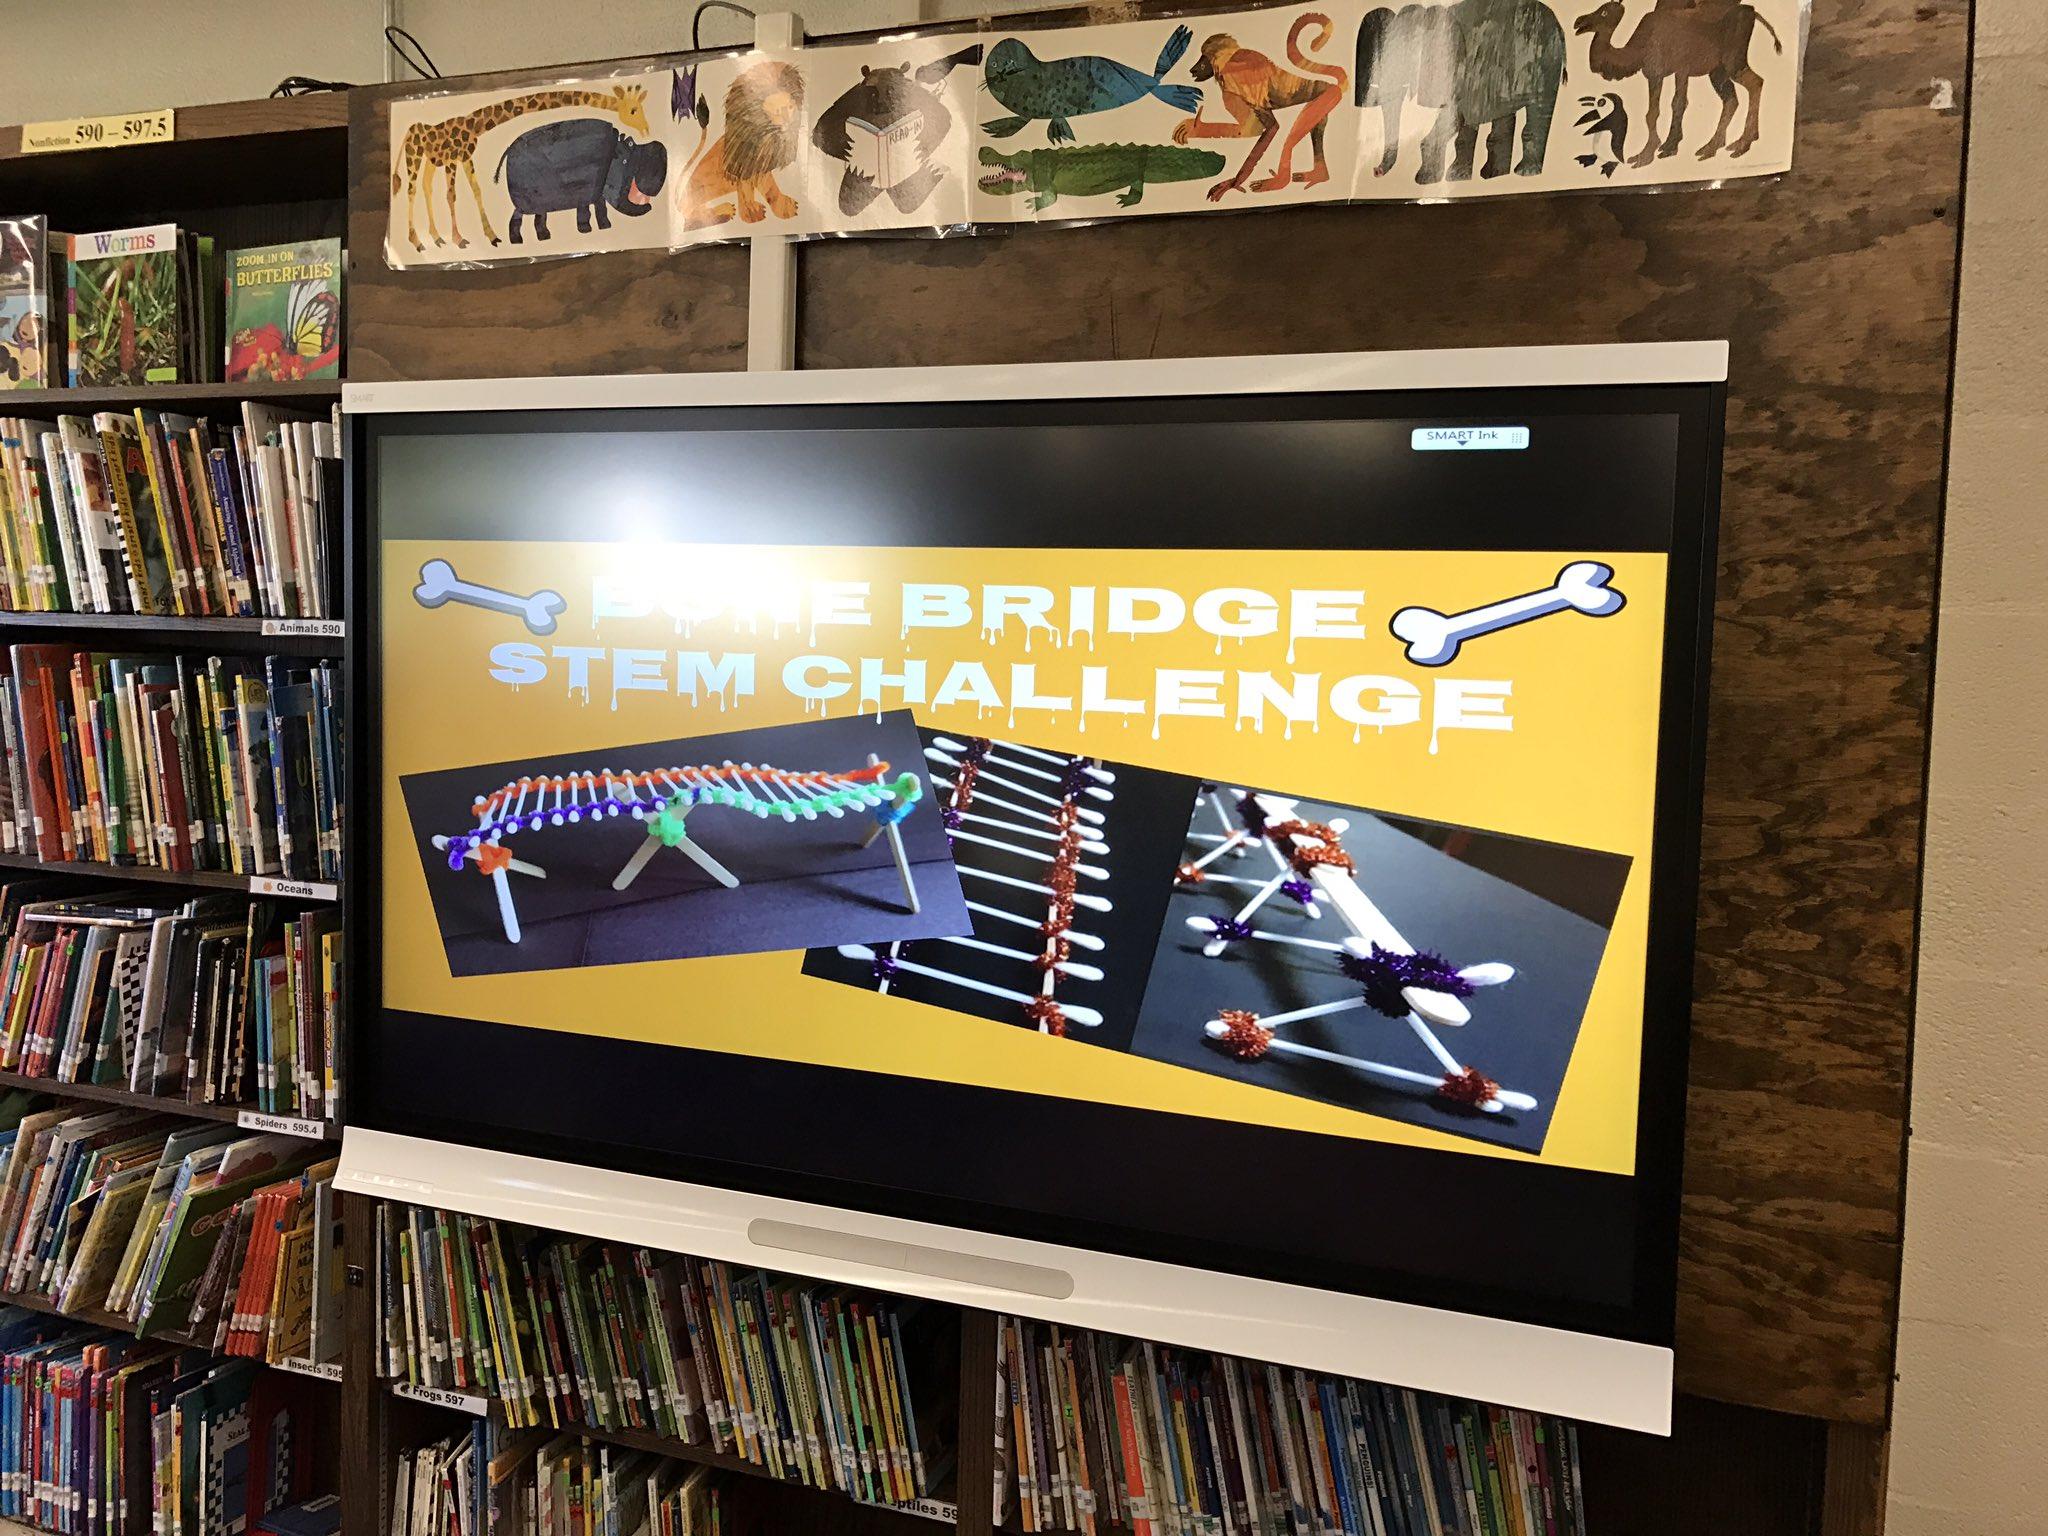 Wwp Library On Twitter Congrats Gr2 Bone Bridge Stem Challenge  # Electro Muebles Keury